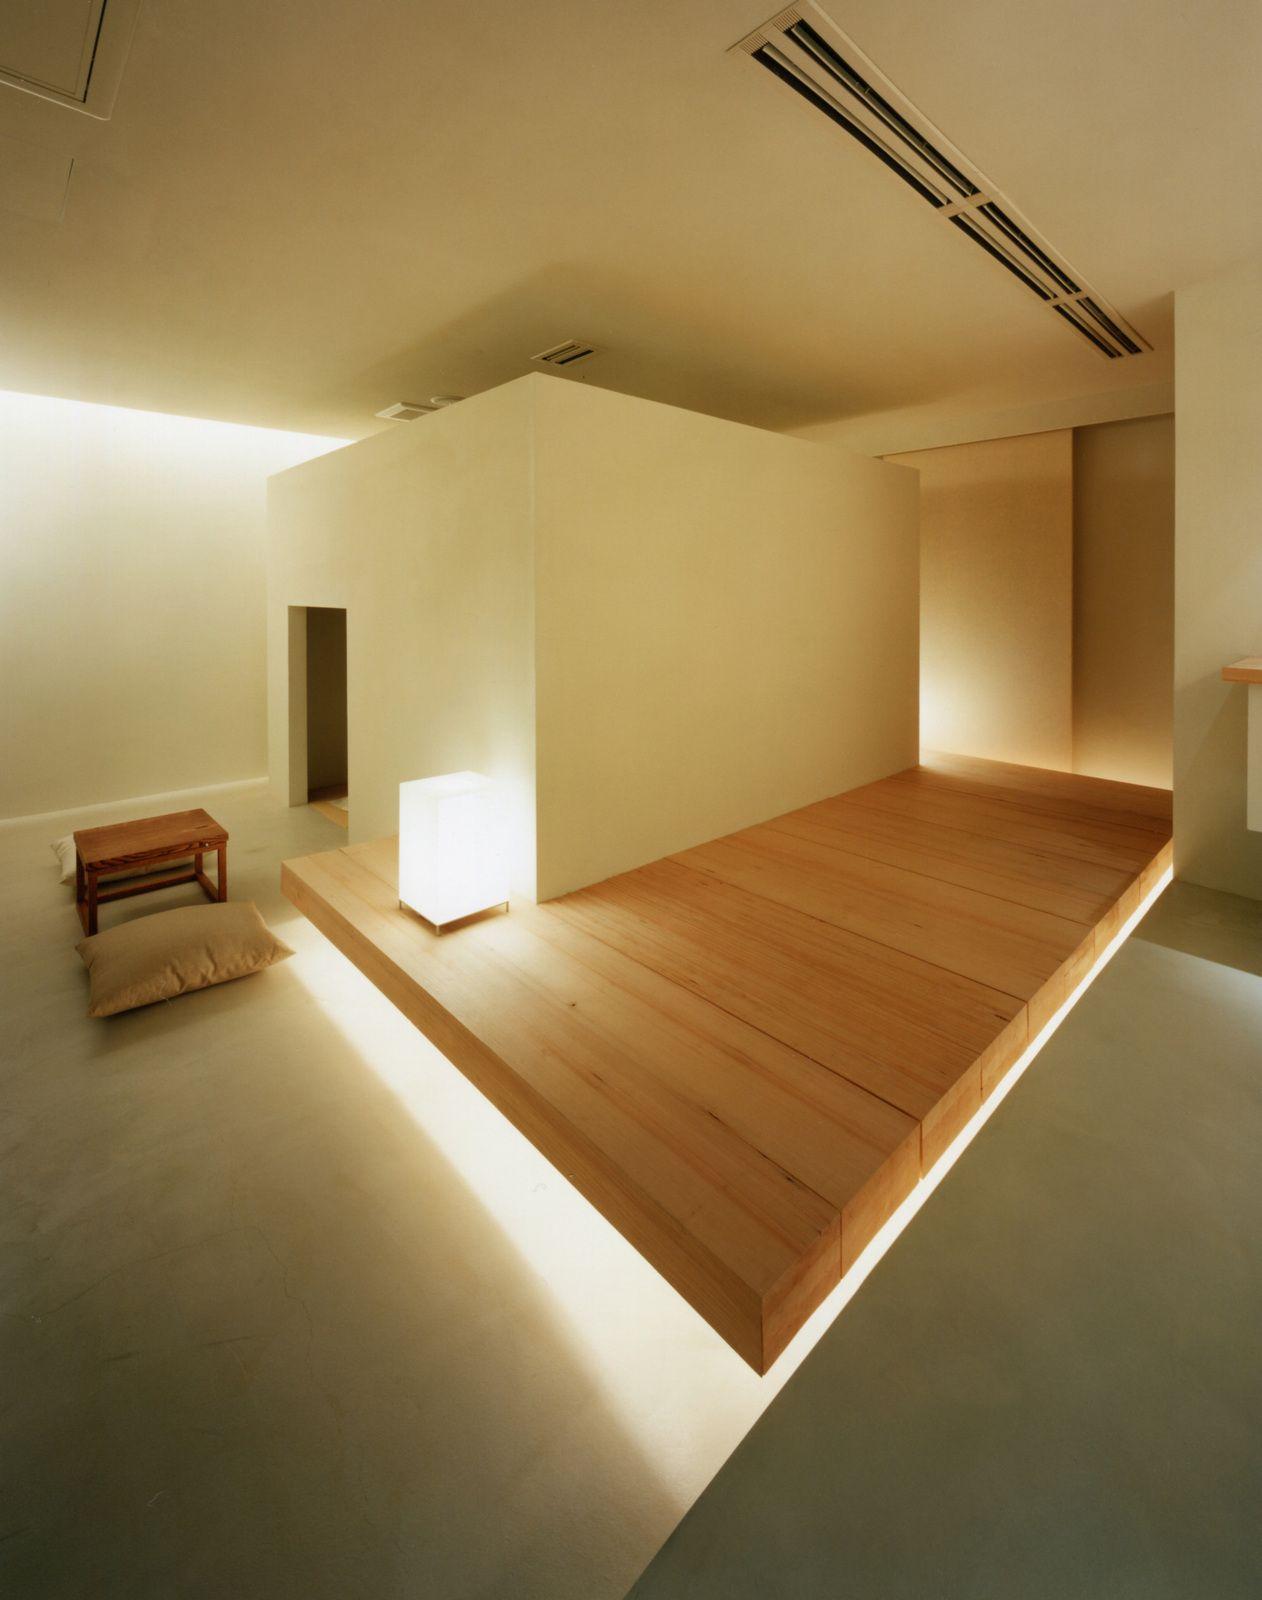 Mifune Design studio ホテル カンラ 京都, デザイナーズホテル, 高級ホテル